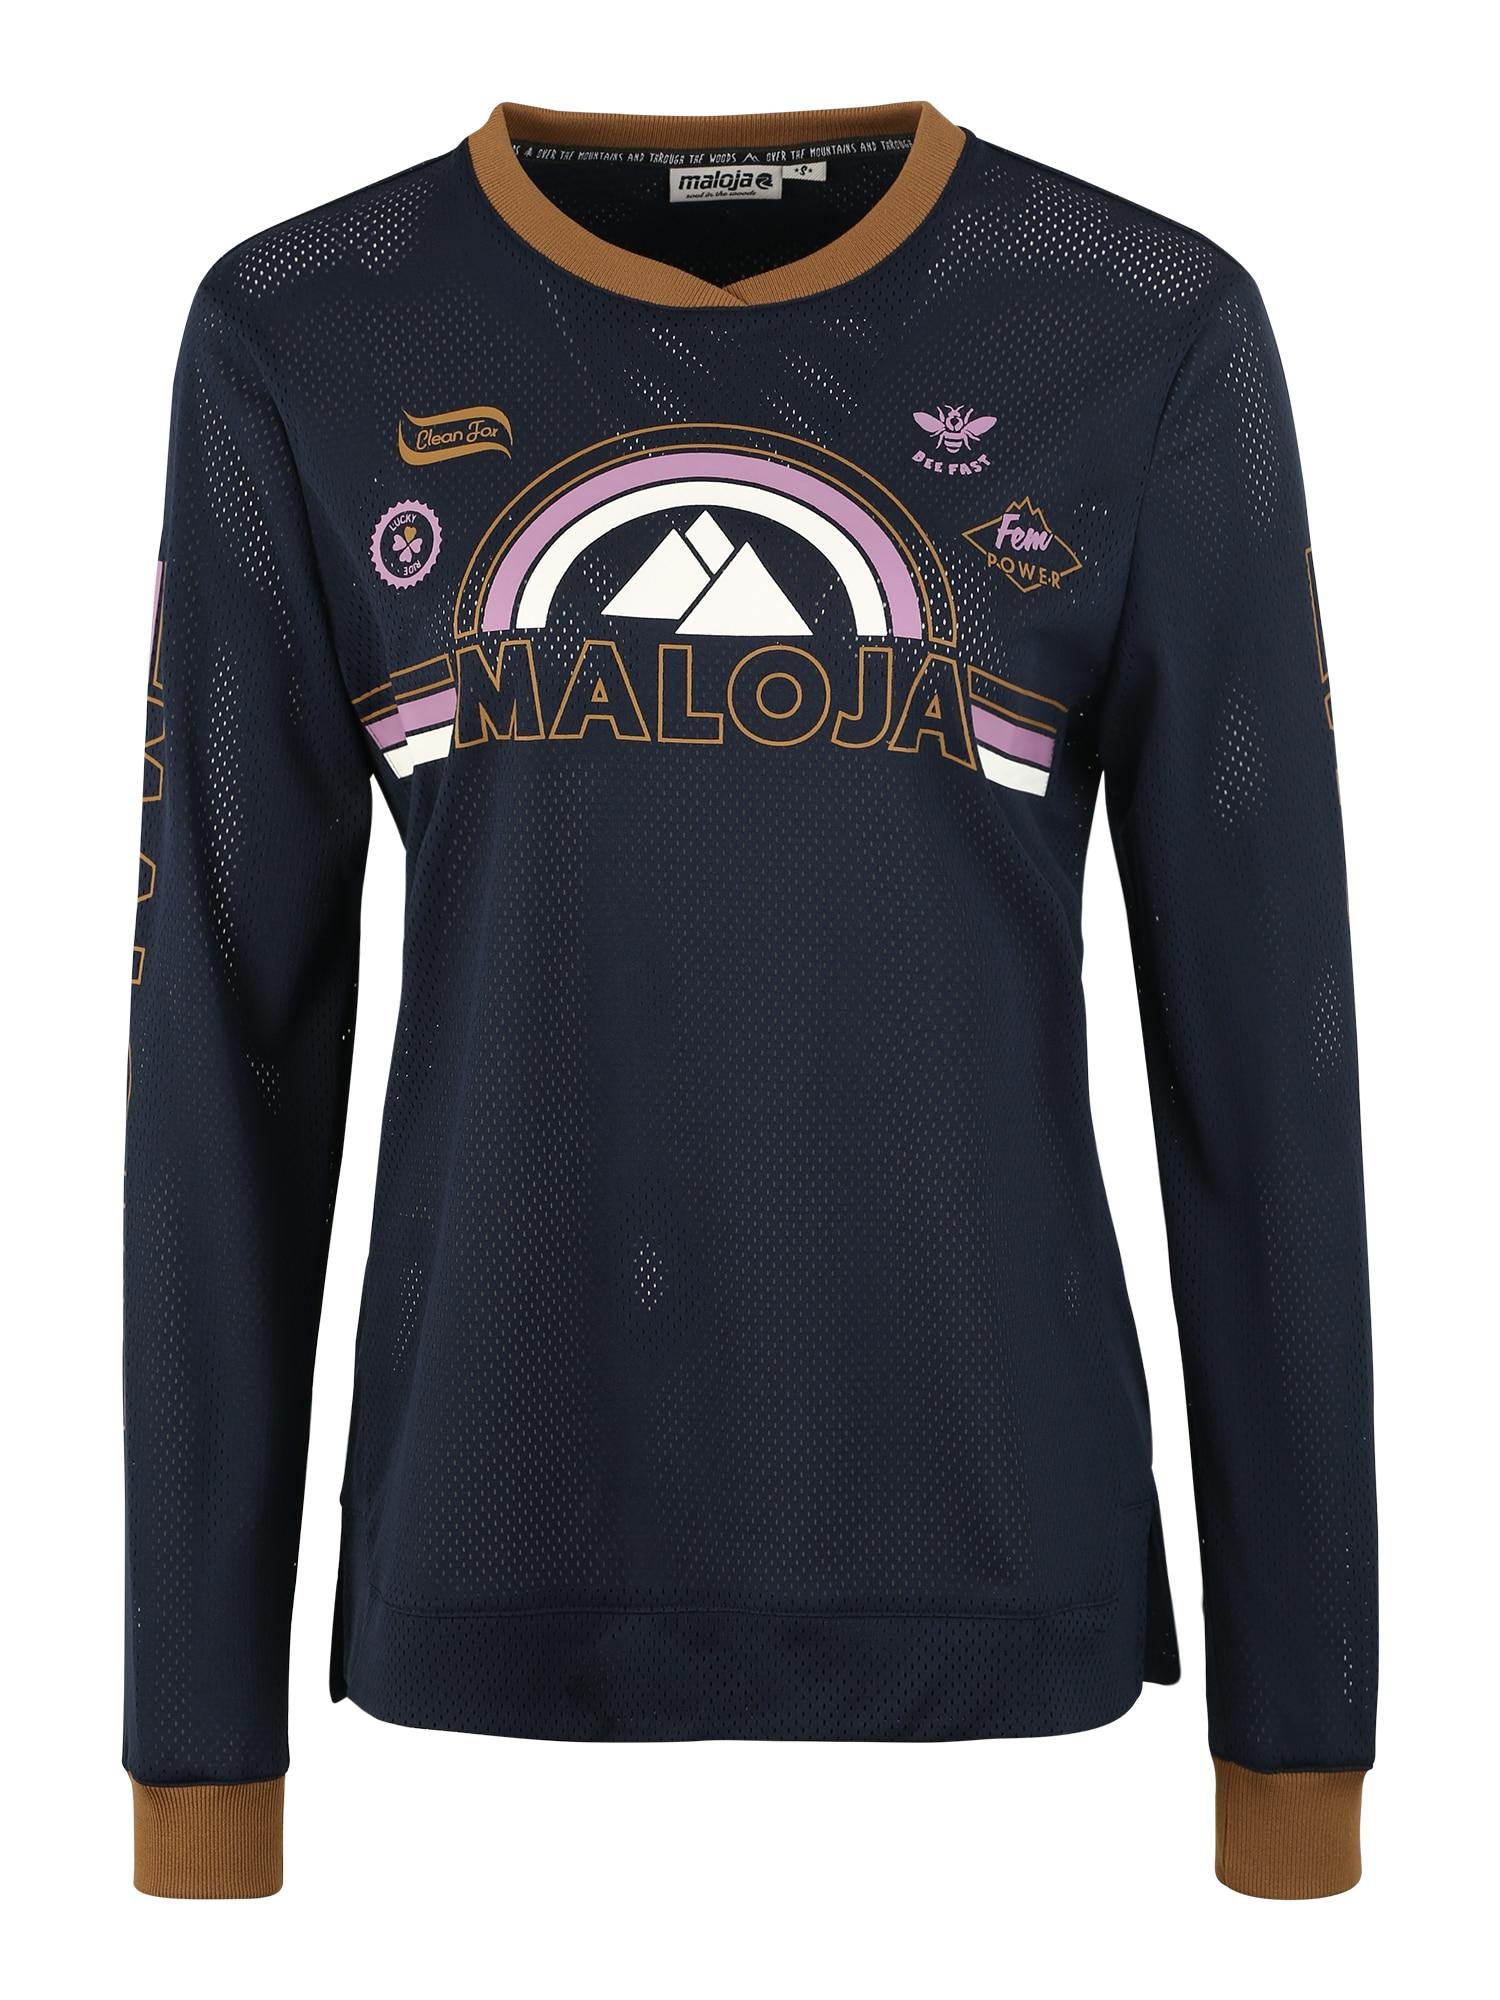 Funkční tričko ScudoriaM. tmavě modrá Maloja